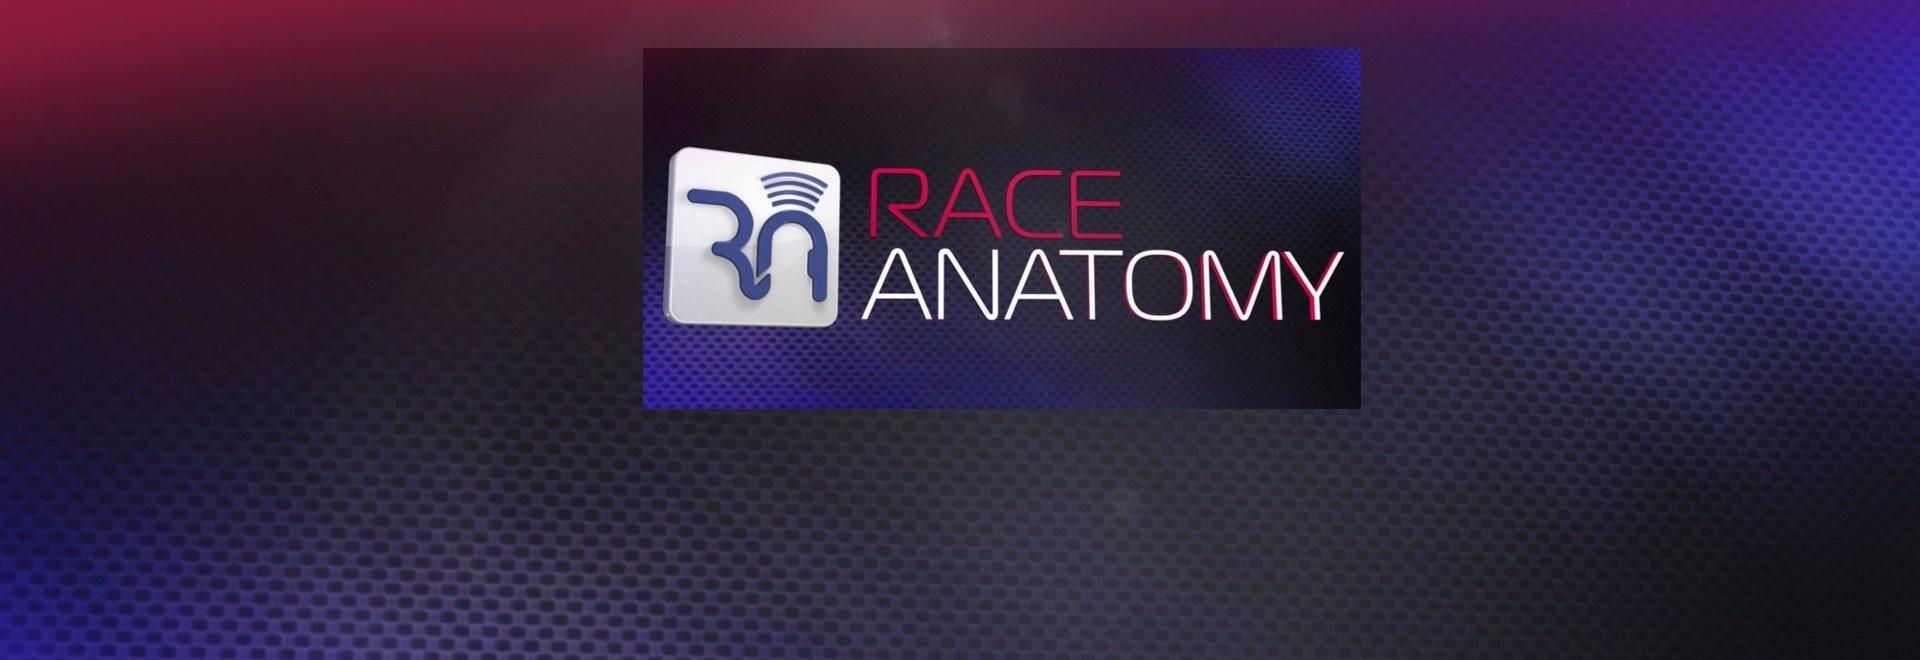 Race Anatomy 99 Rosso